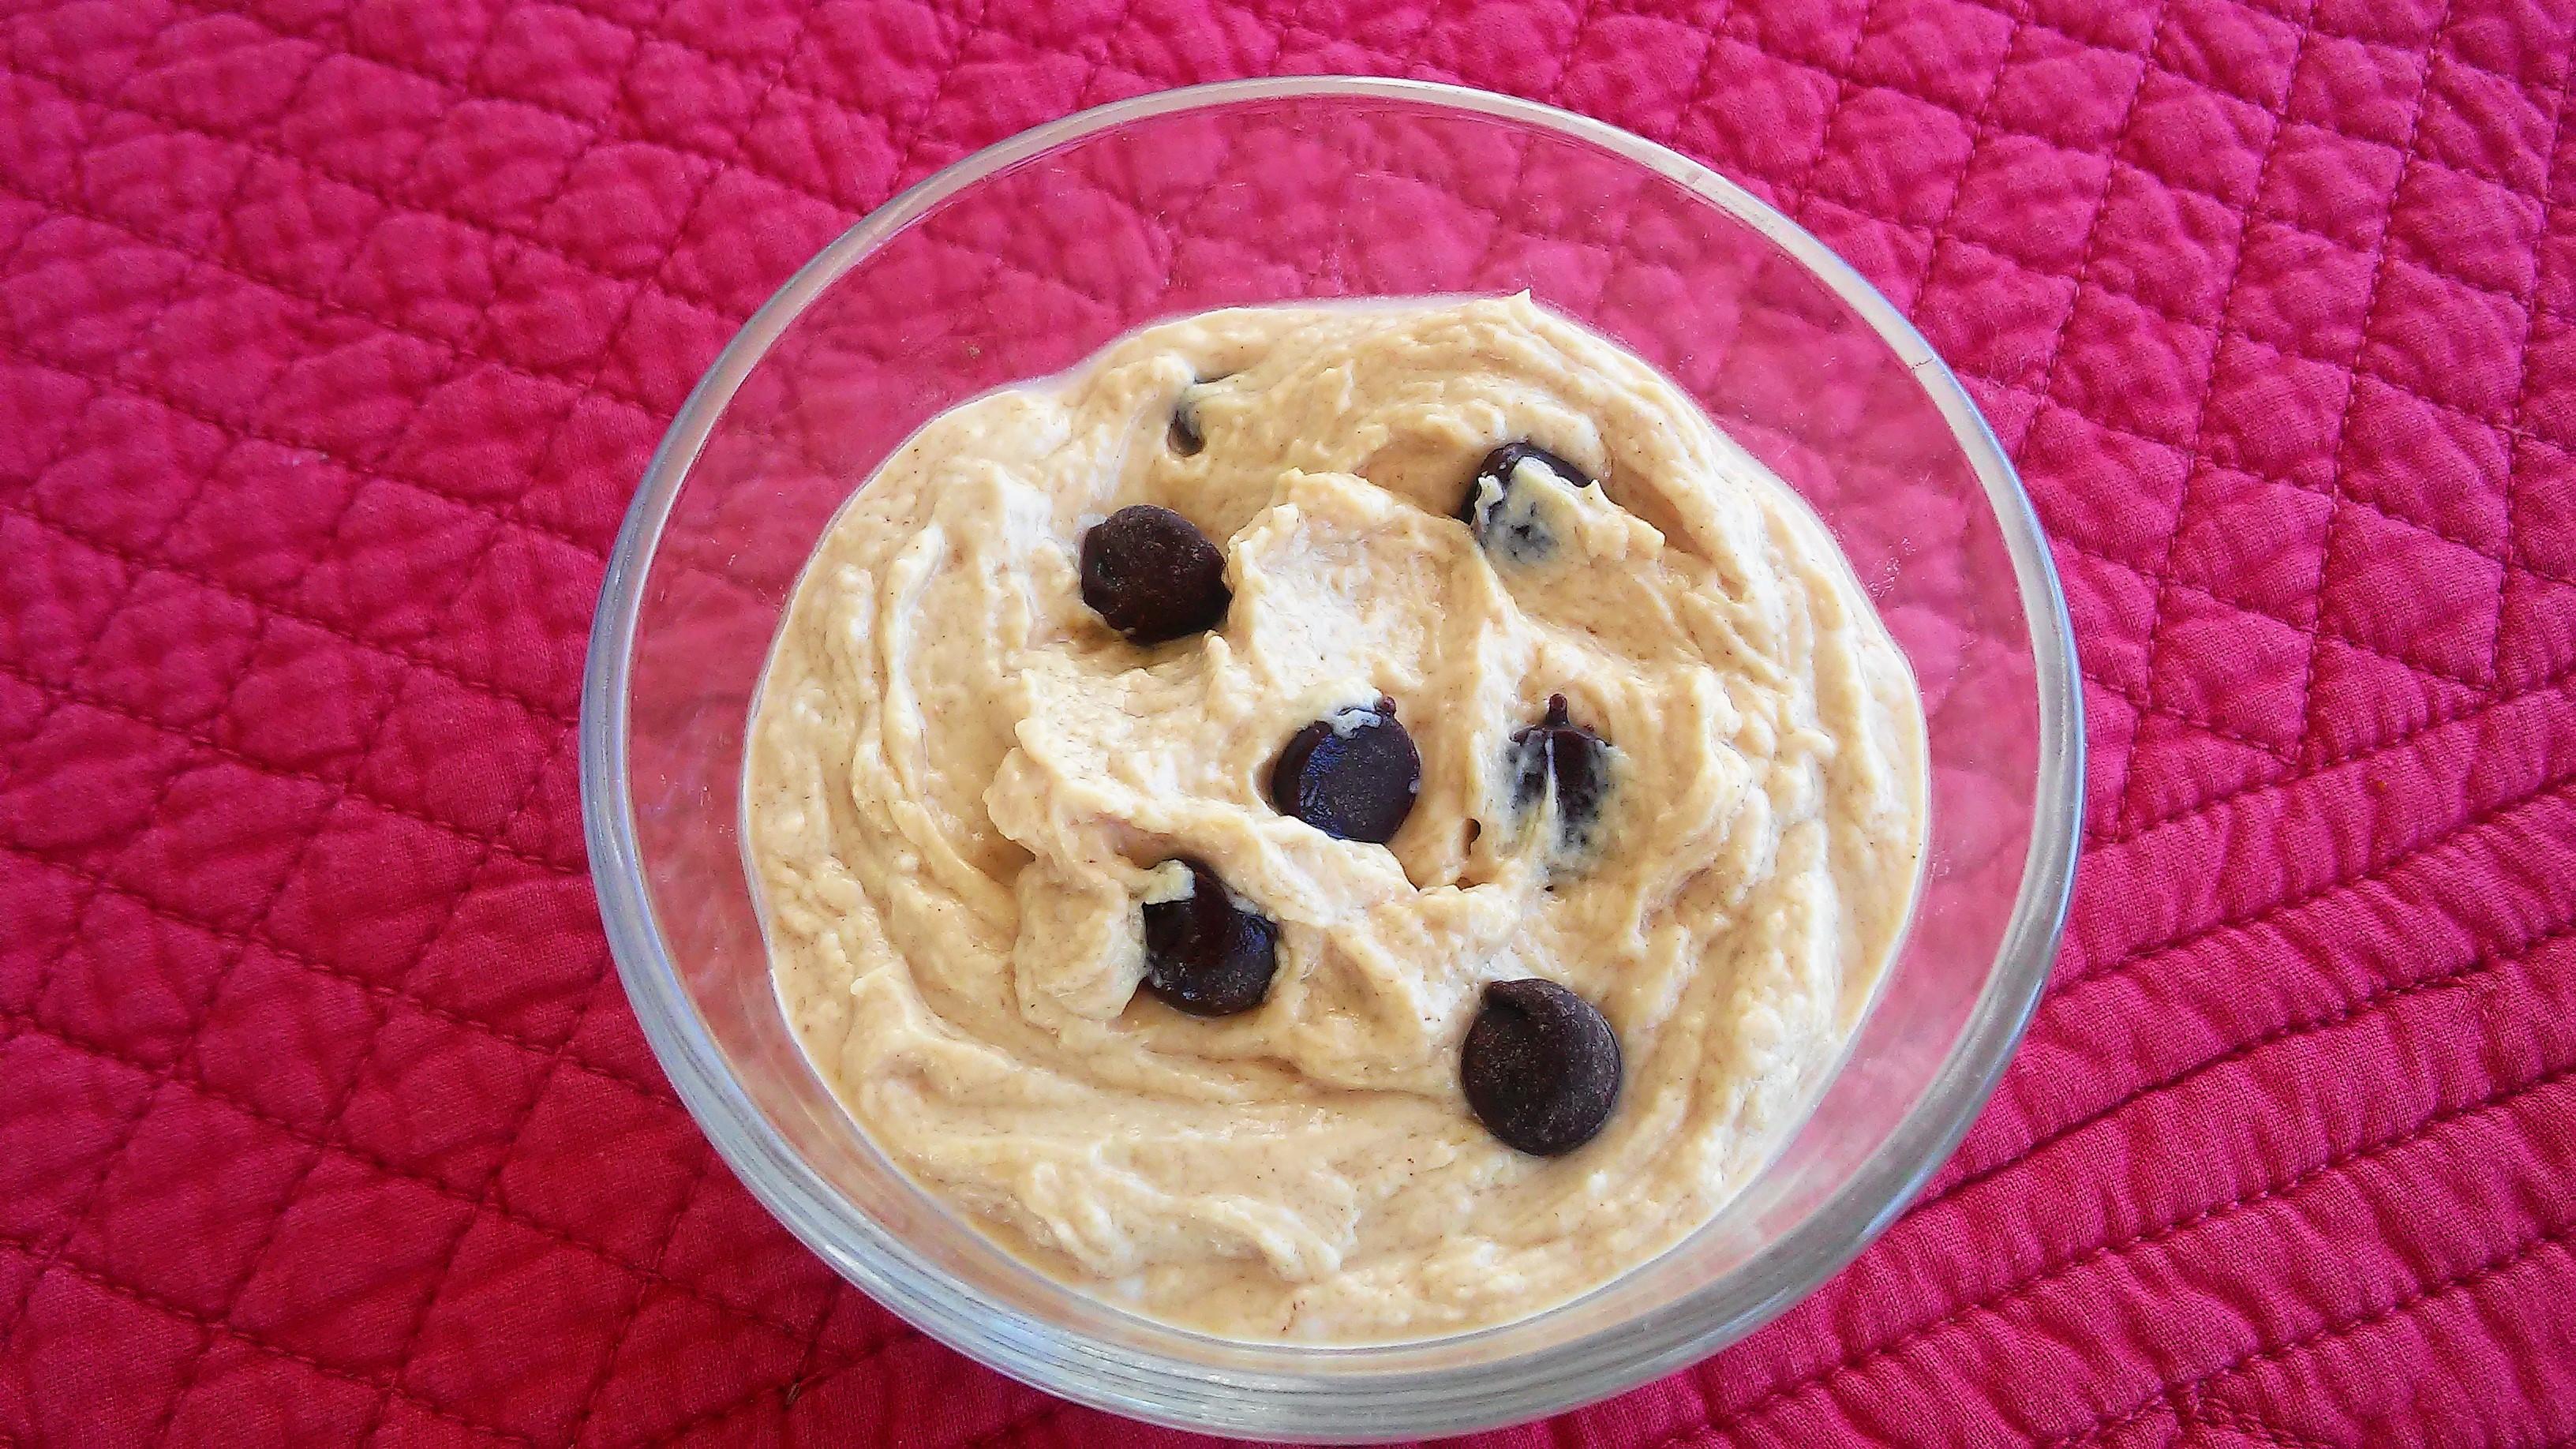 Healthy Peanut Butter Mousse Tammy Lynn